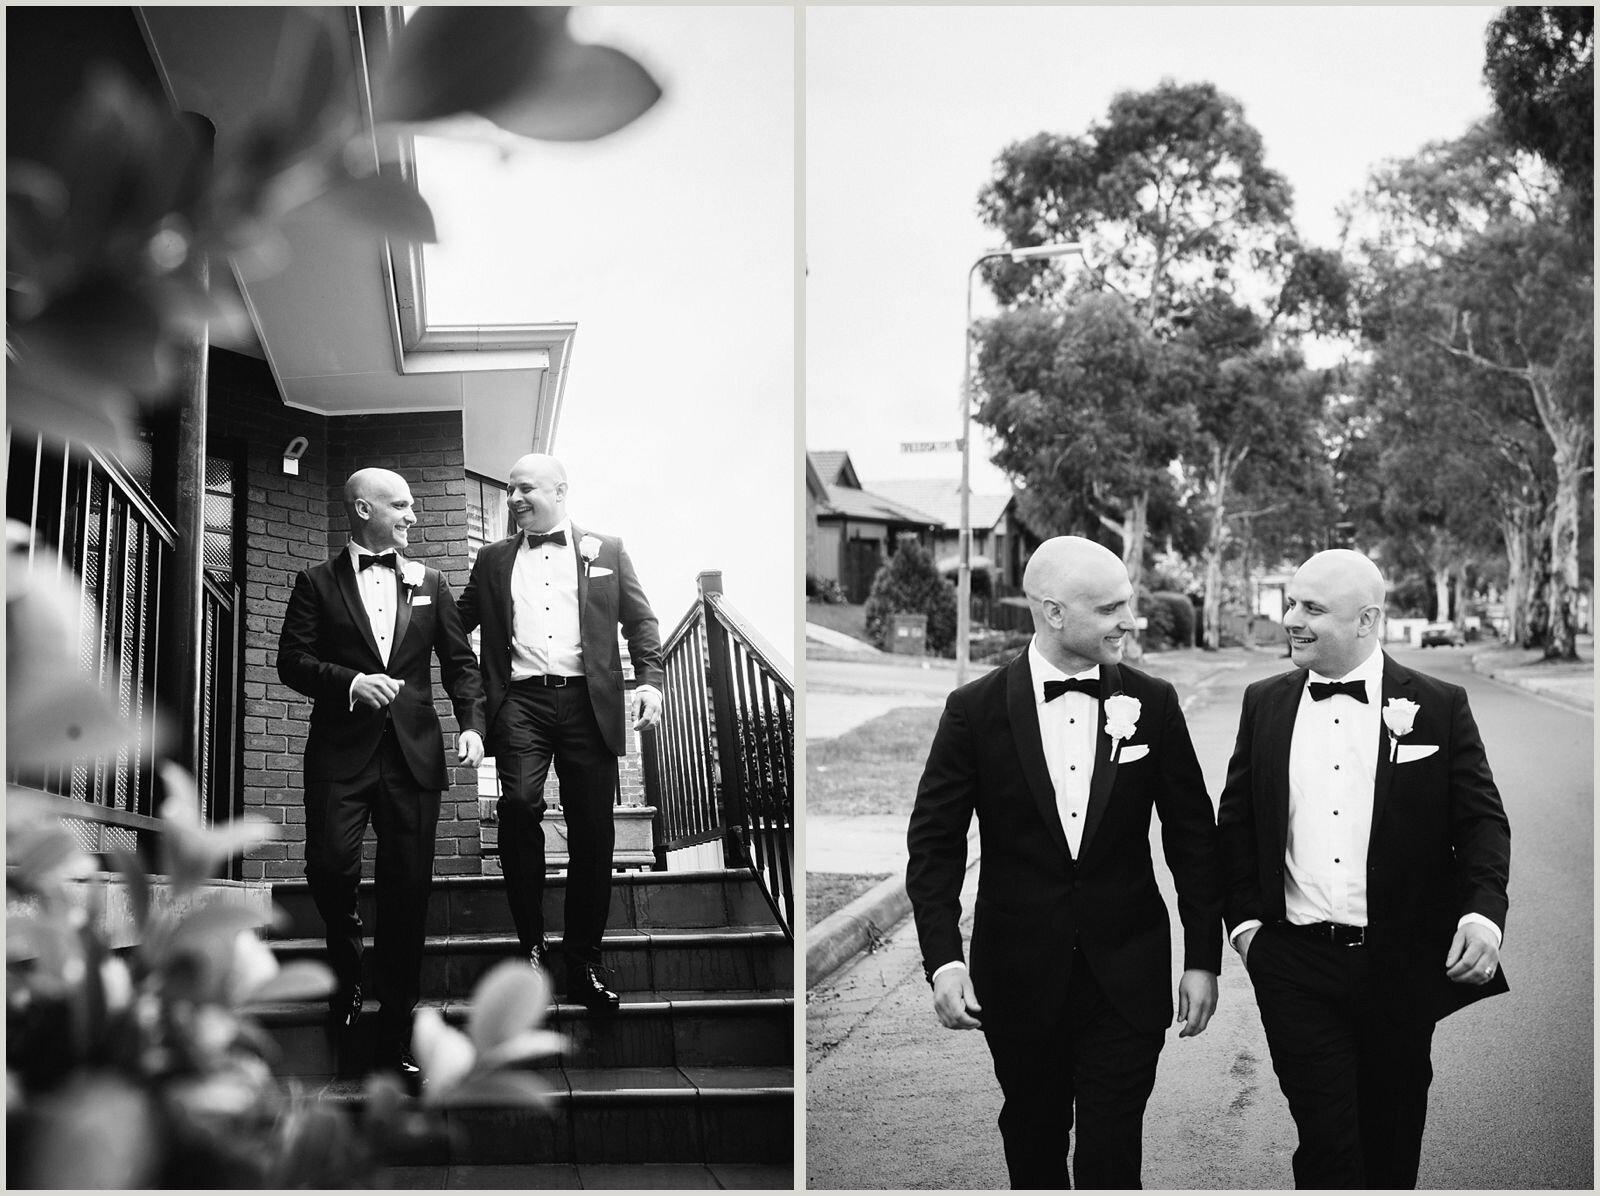 joseph_koprek_wedding_melbourne_the_prince_deck_0006.jpg